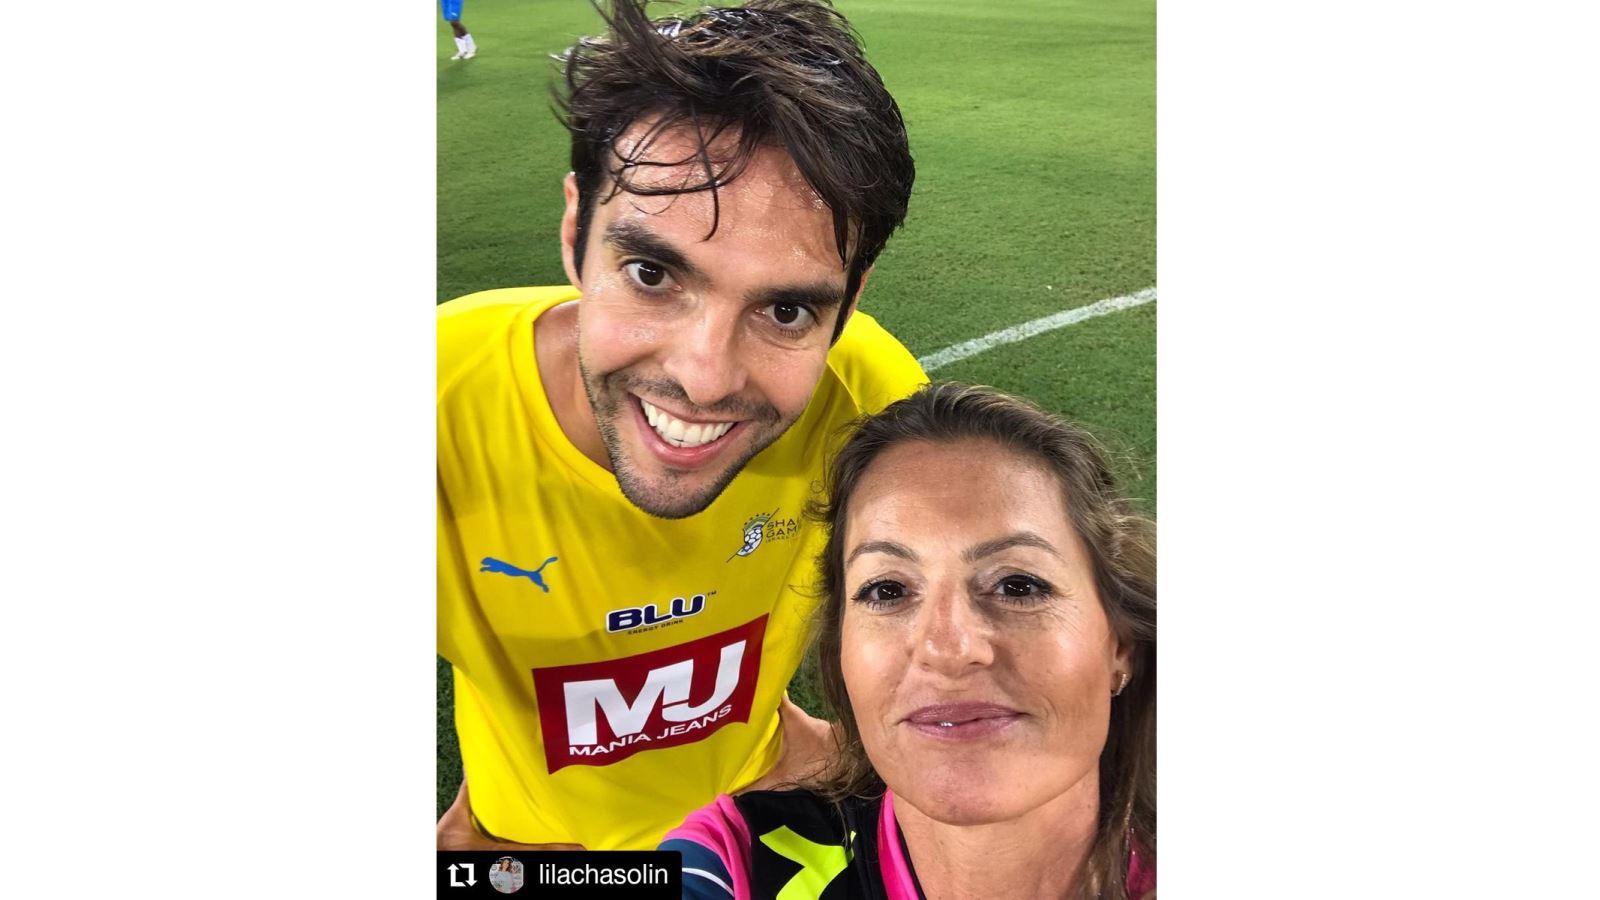 Kaka, nữ trọng tài, Brazil, Israel, selfie, Ronaldinho, Roberto Carlos, Rivaldo, Cafu, Bebeto